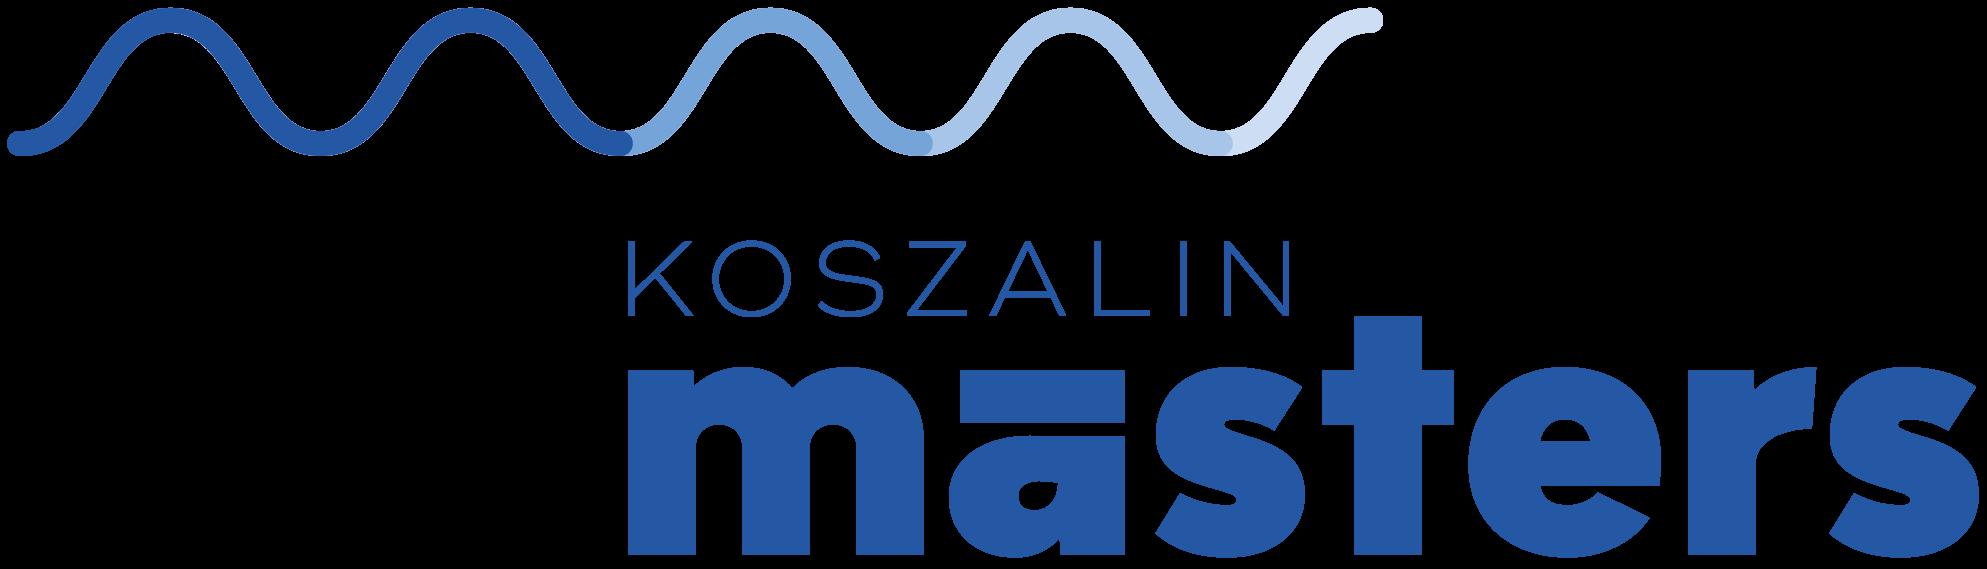 TKKF Koszalin Masters - Sekcja pływacka